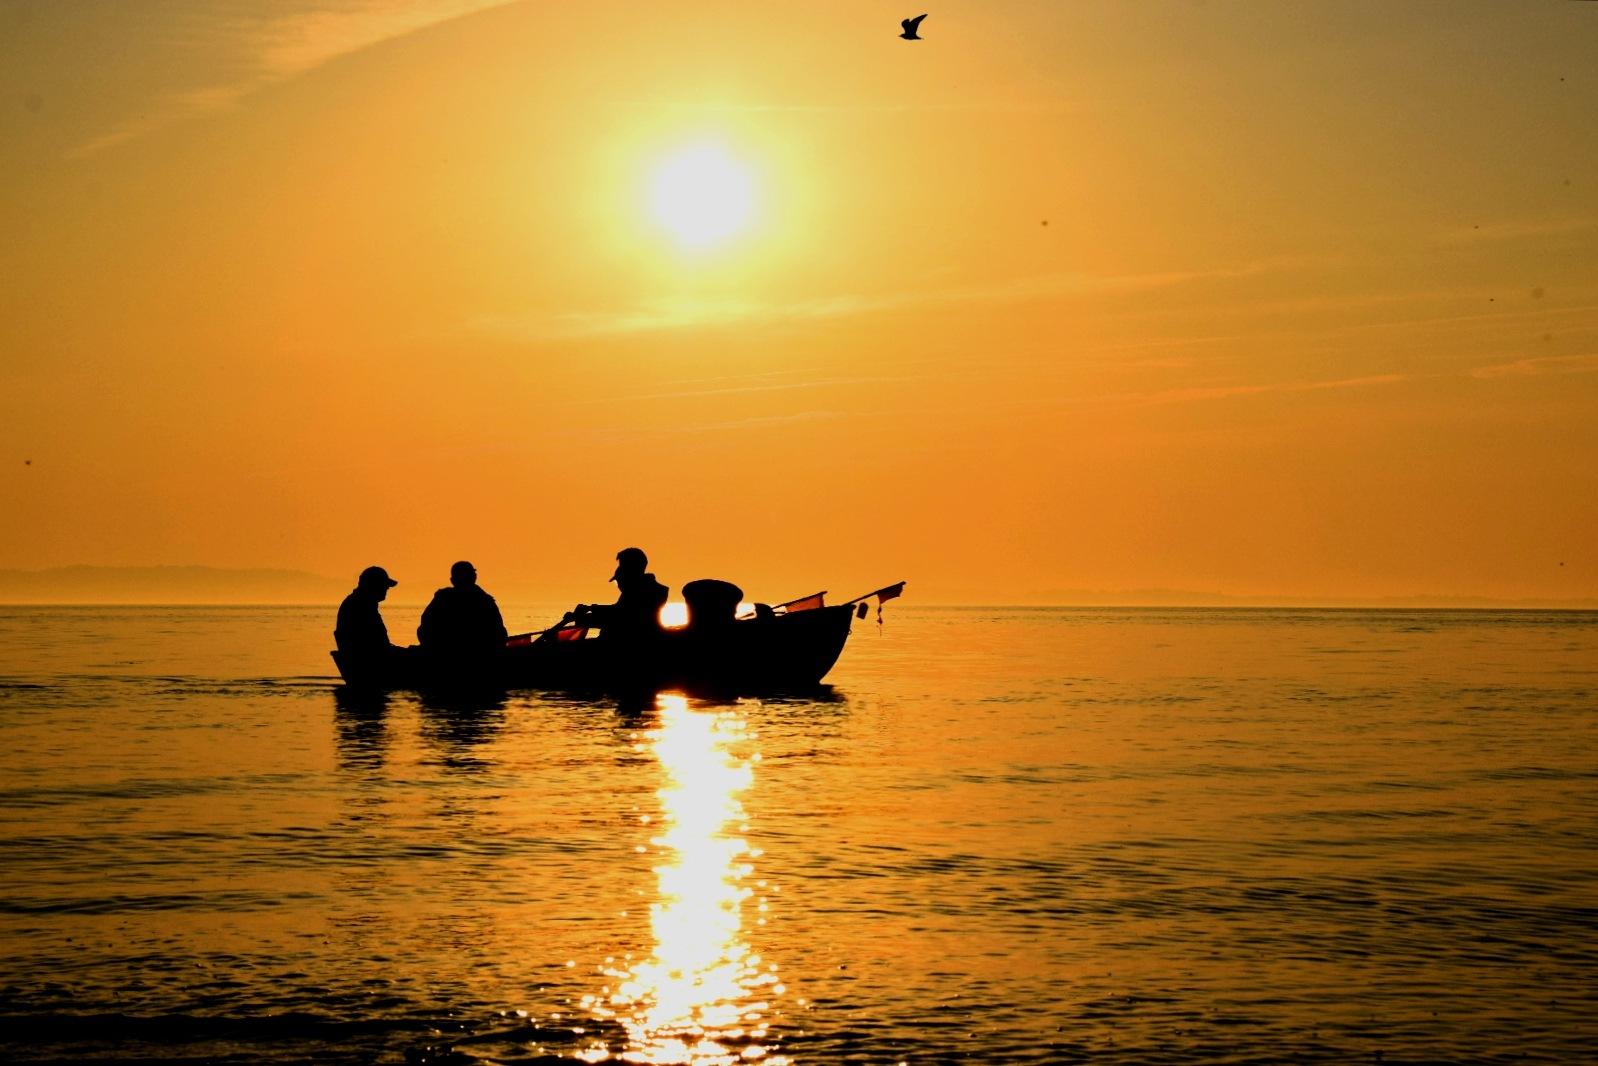 Fishing before sunset by lafriha